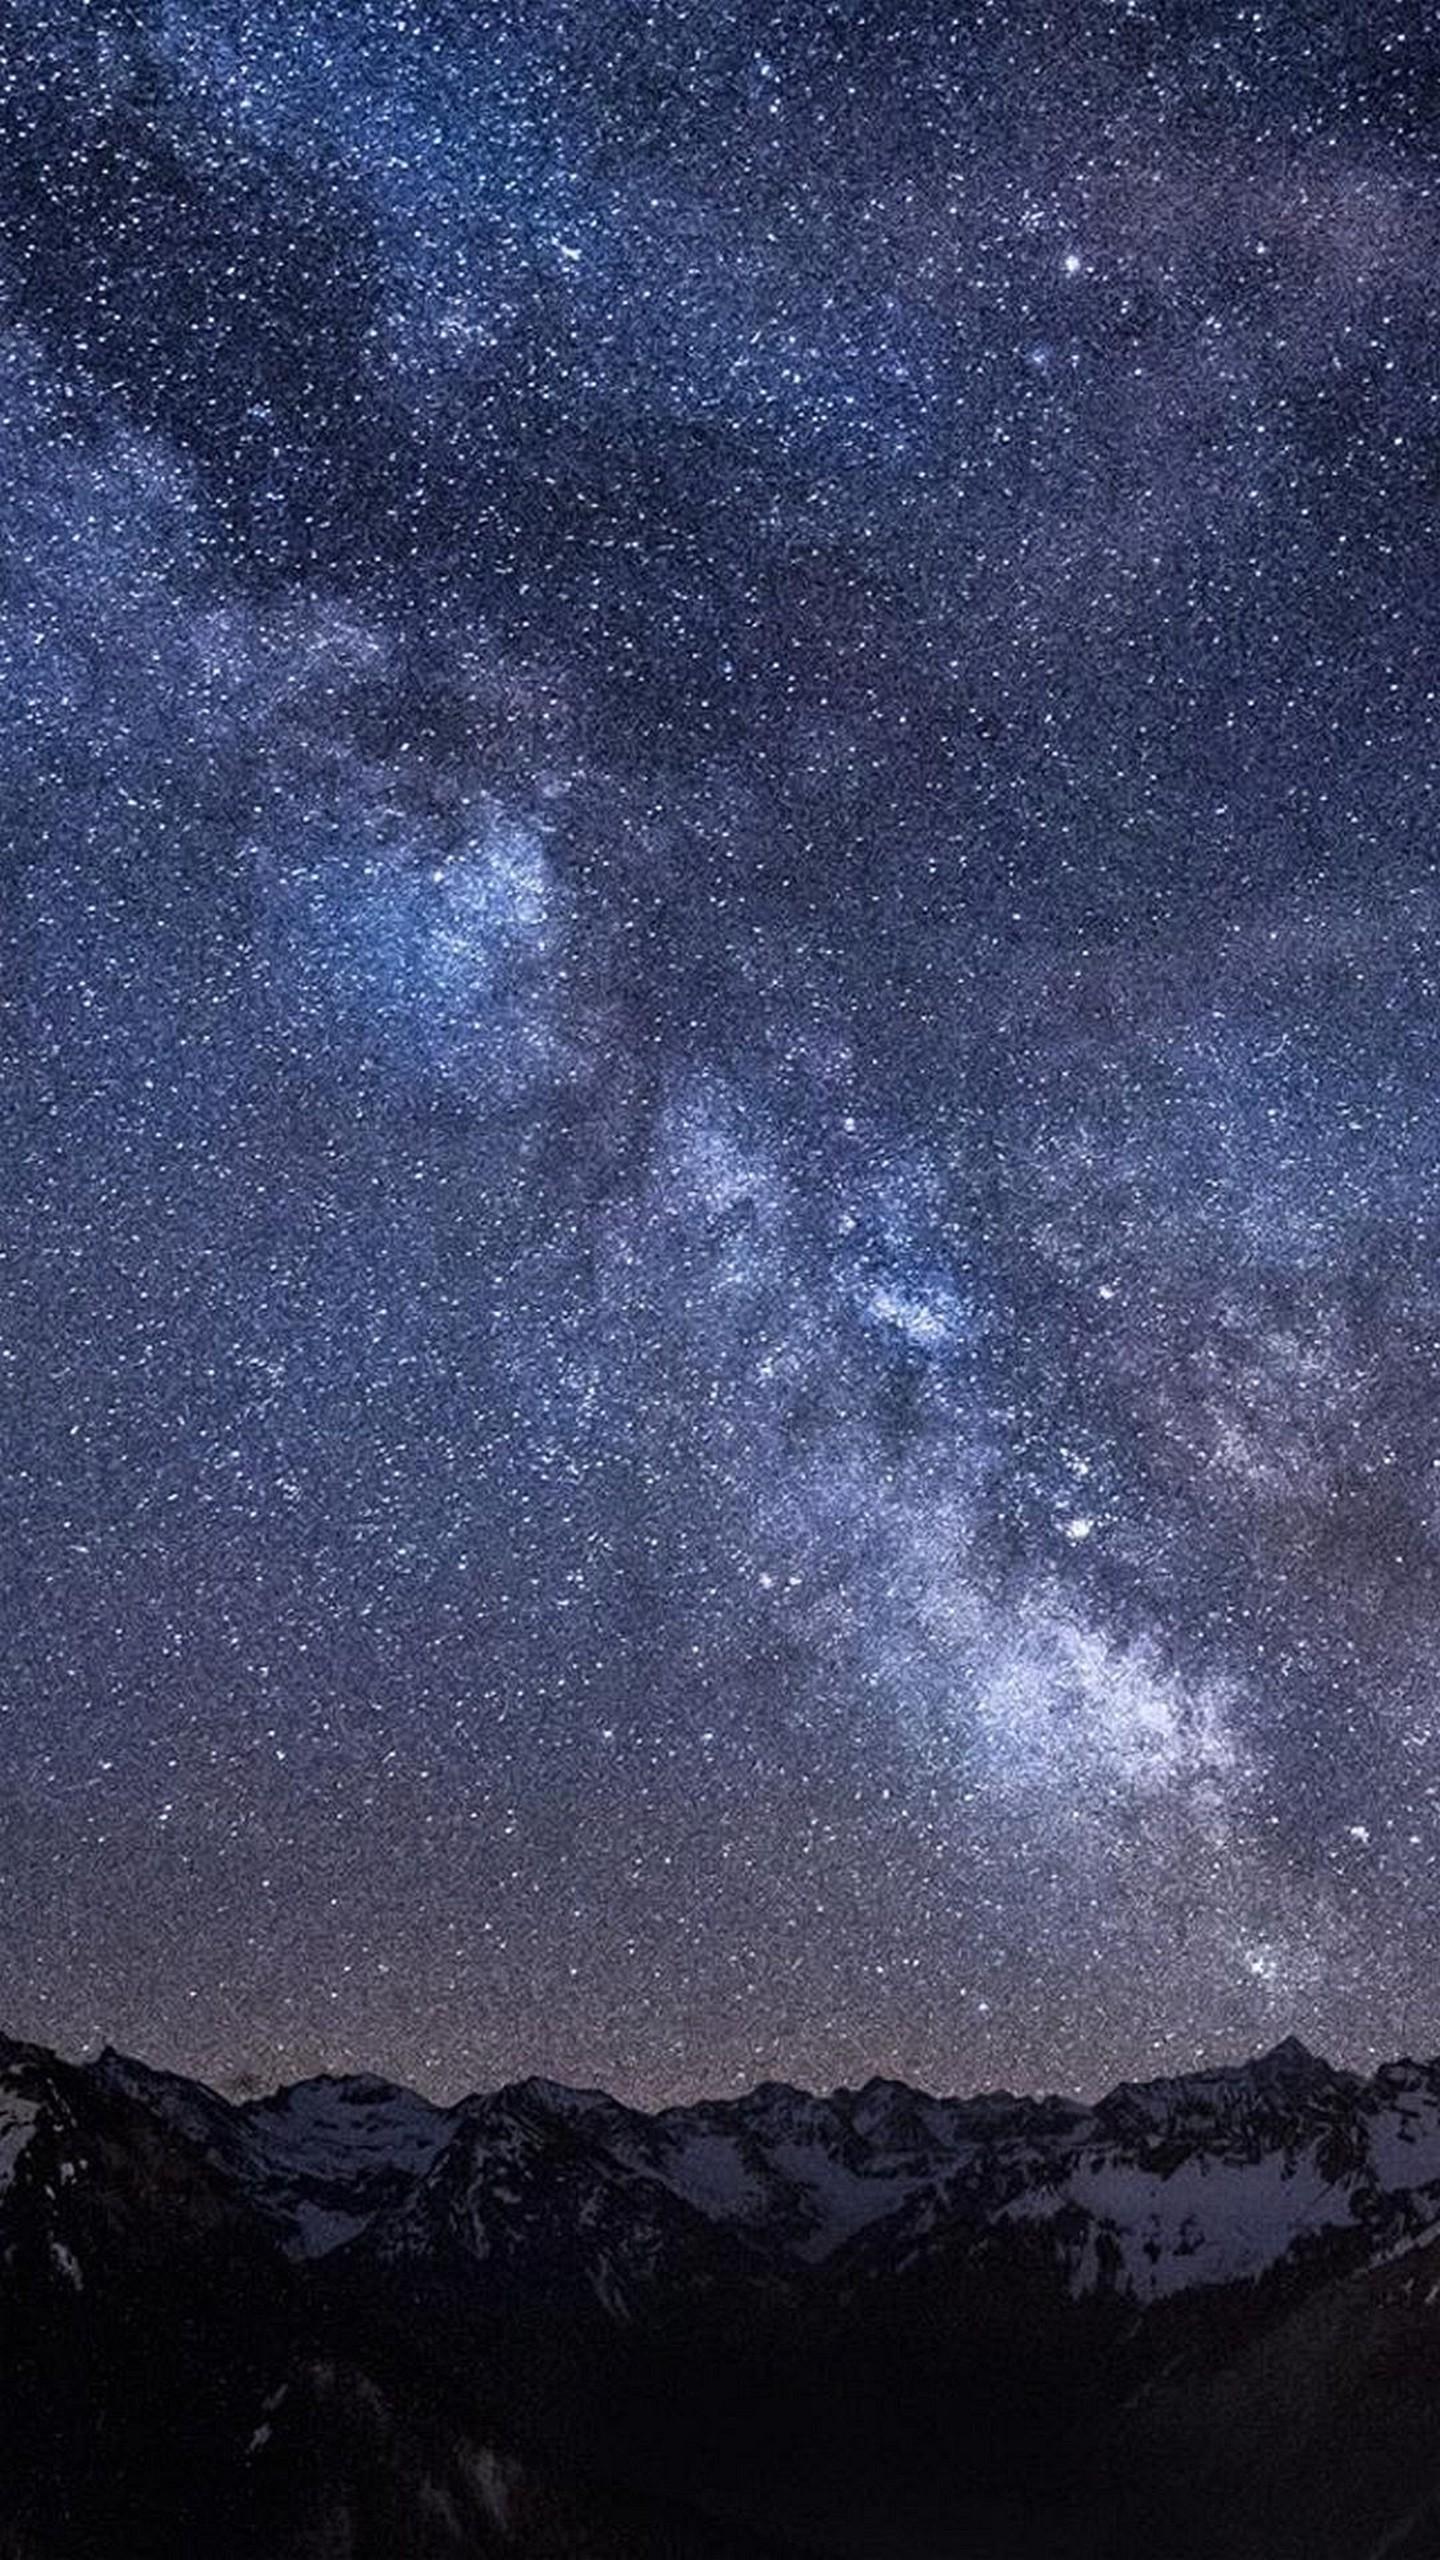 夜空の壁紙iphone 1440 X 2560 4k壁紙 1440x2560 Wallpapertip